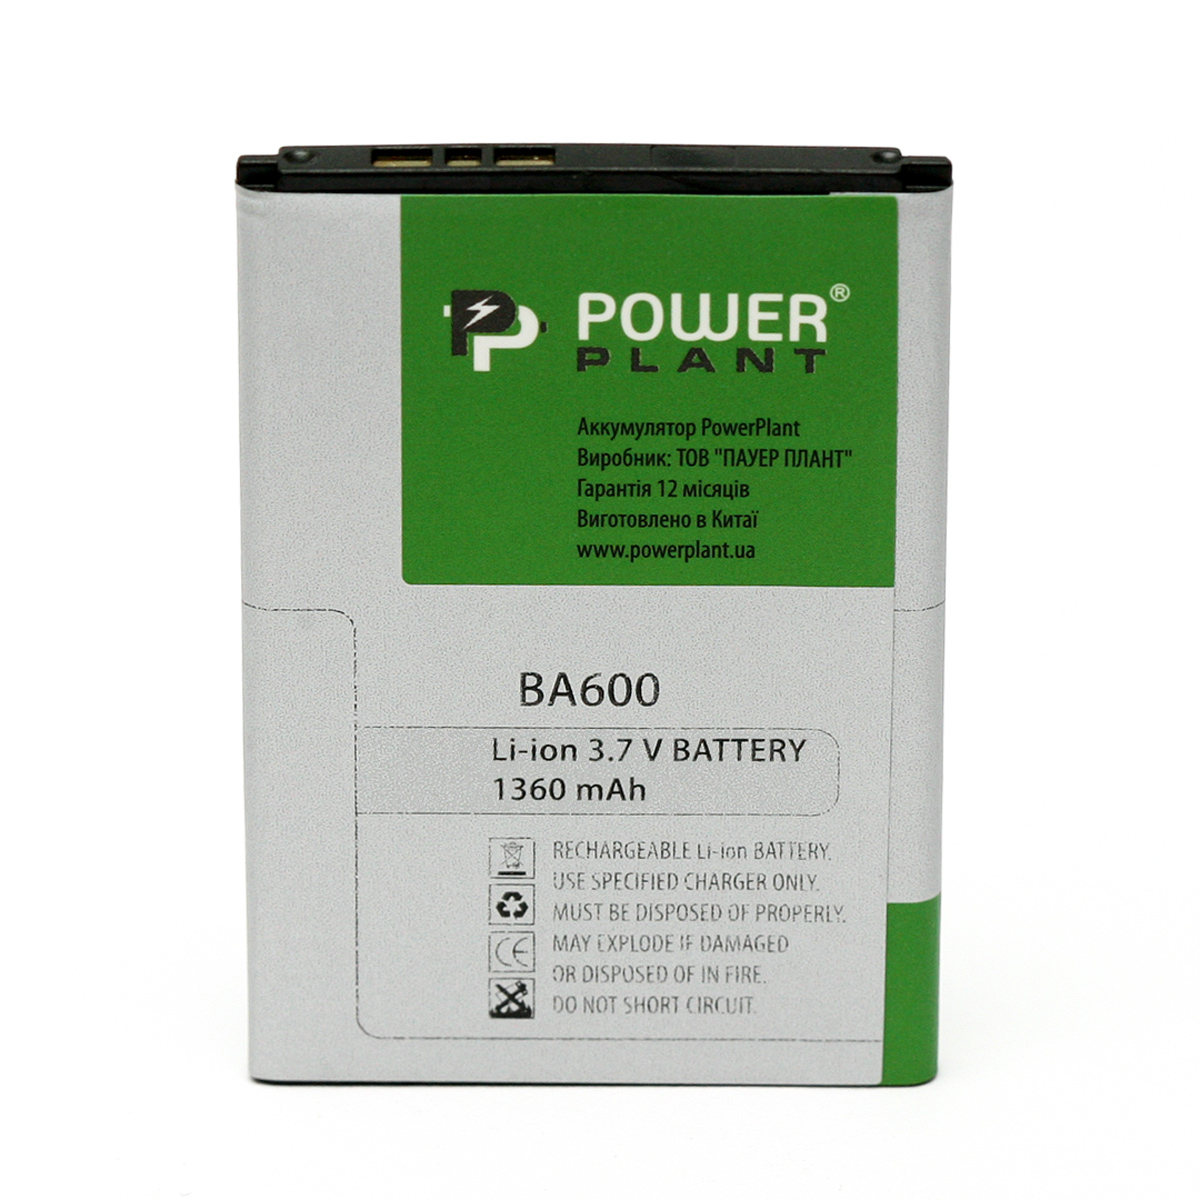 Купить Аккумулятор PowerPlant Sony Ericsson ST25i (BA600) 1360mAh